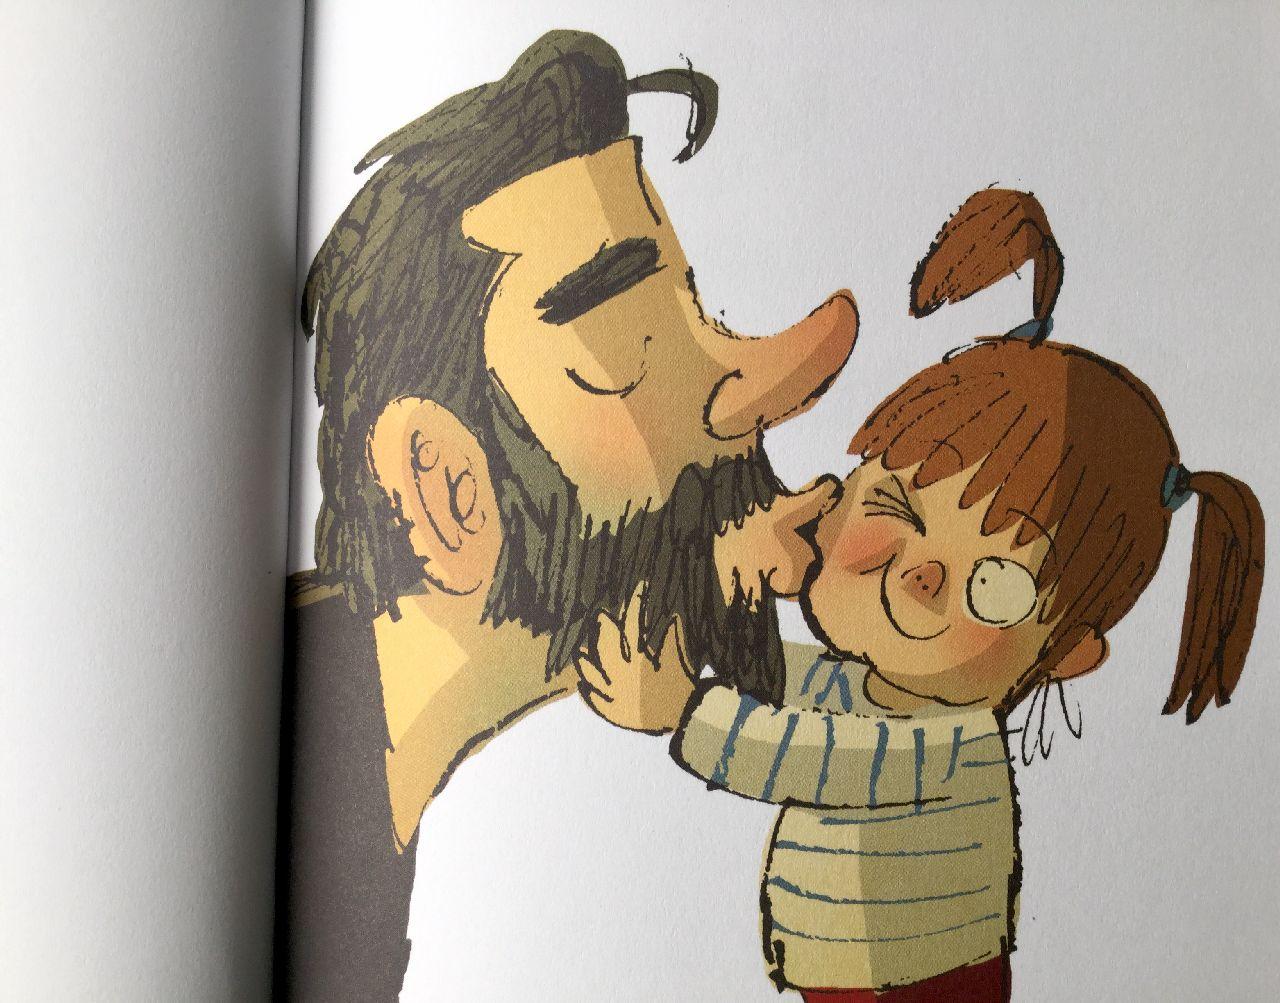 David Pintor, Parole bambine, Lapis